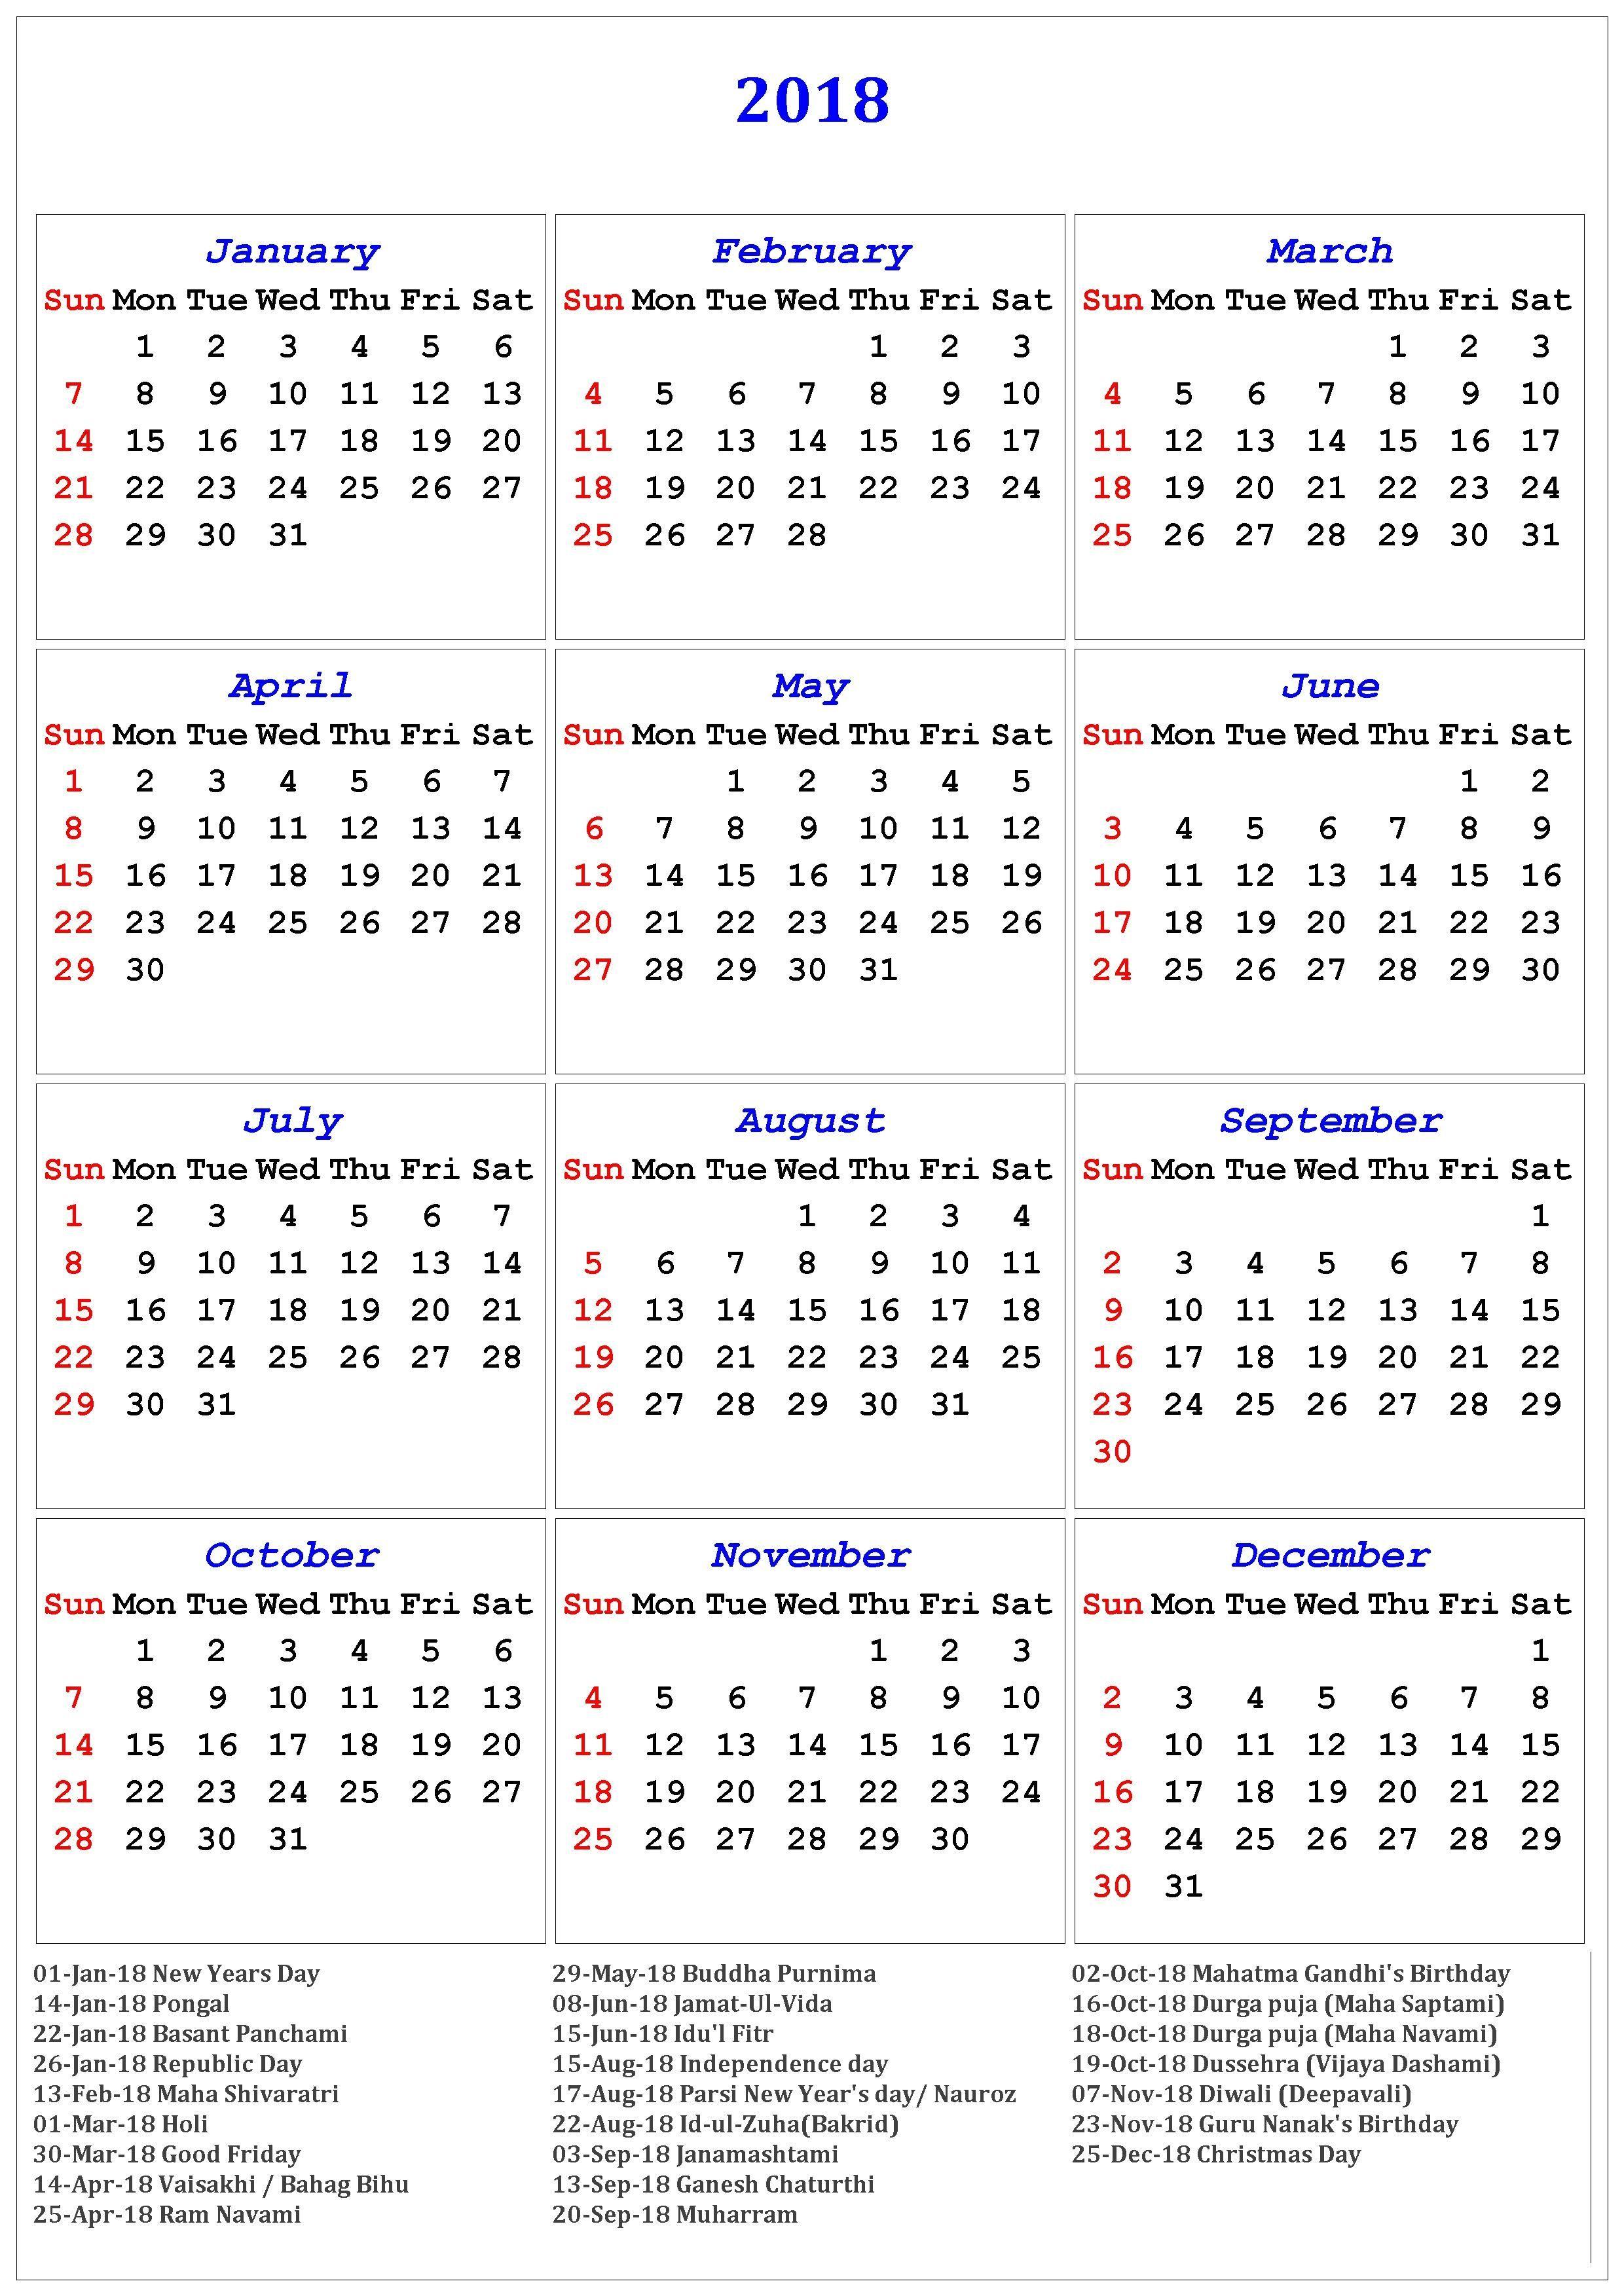 2020 And 2018 Calendar With Holidays 2018 Calendar Of Holidays | November Calendar | November calendar